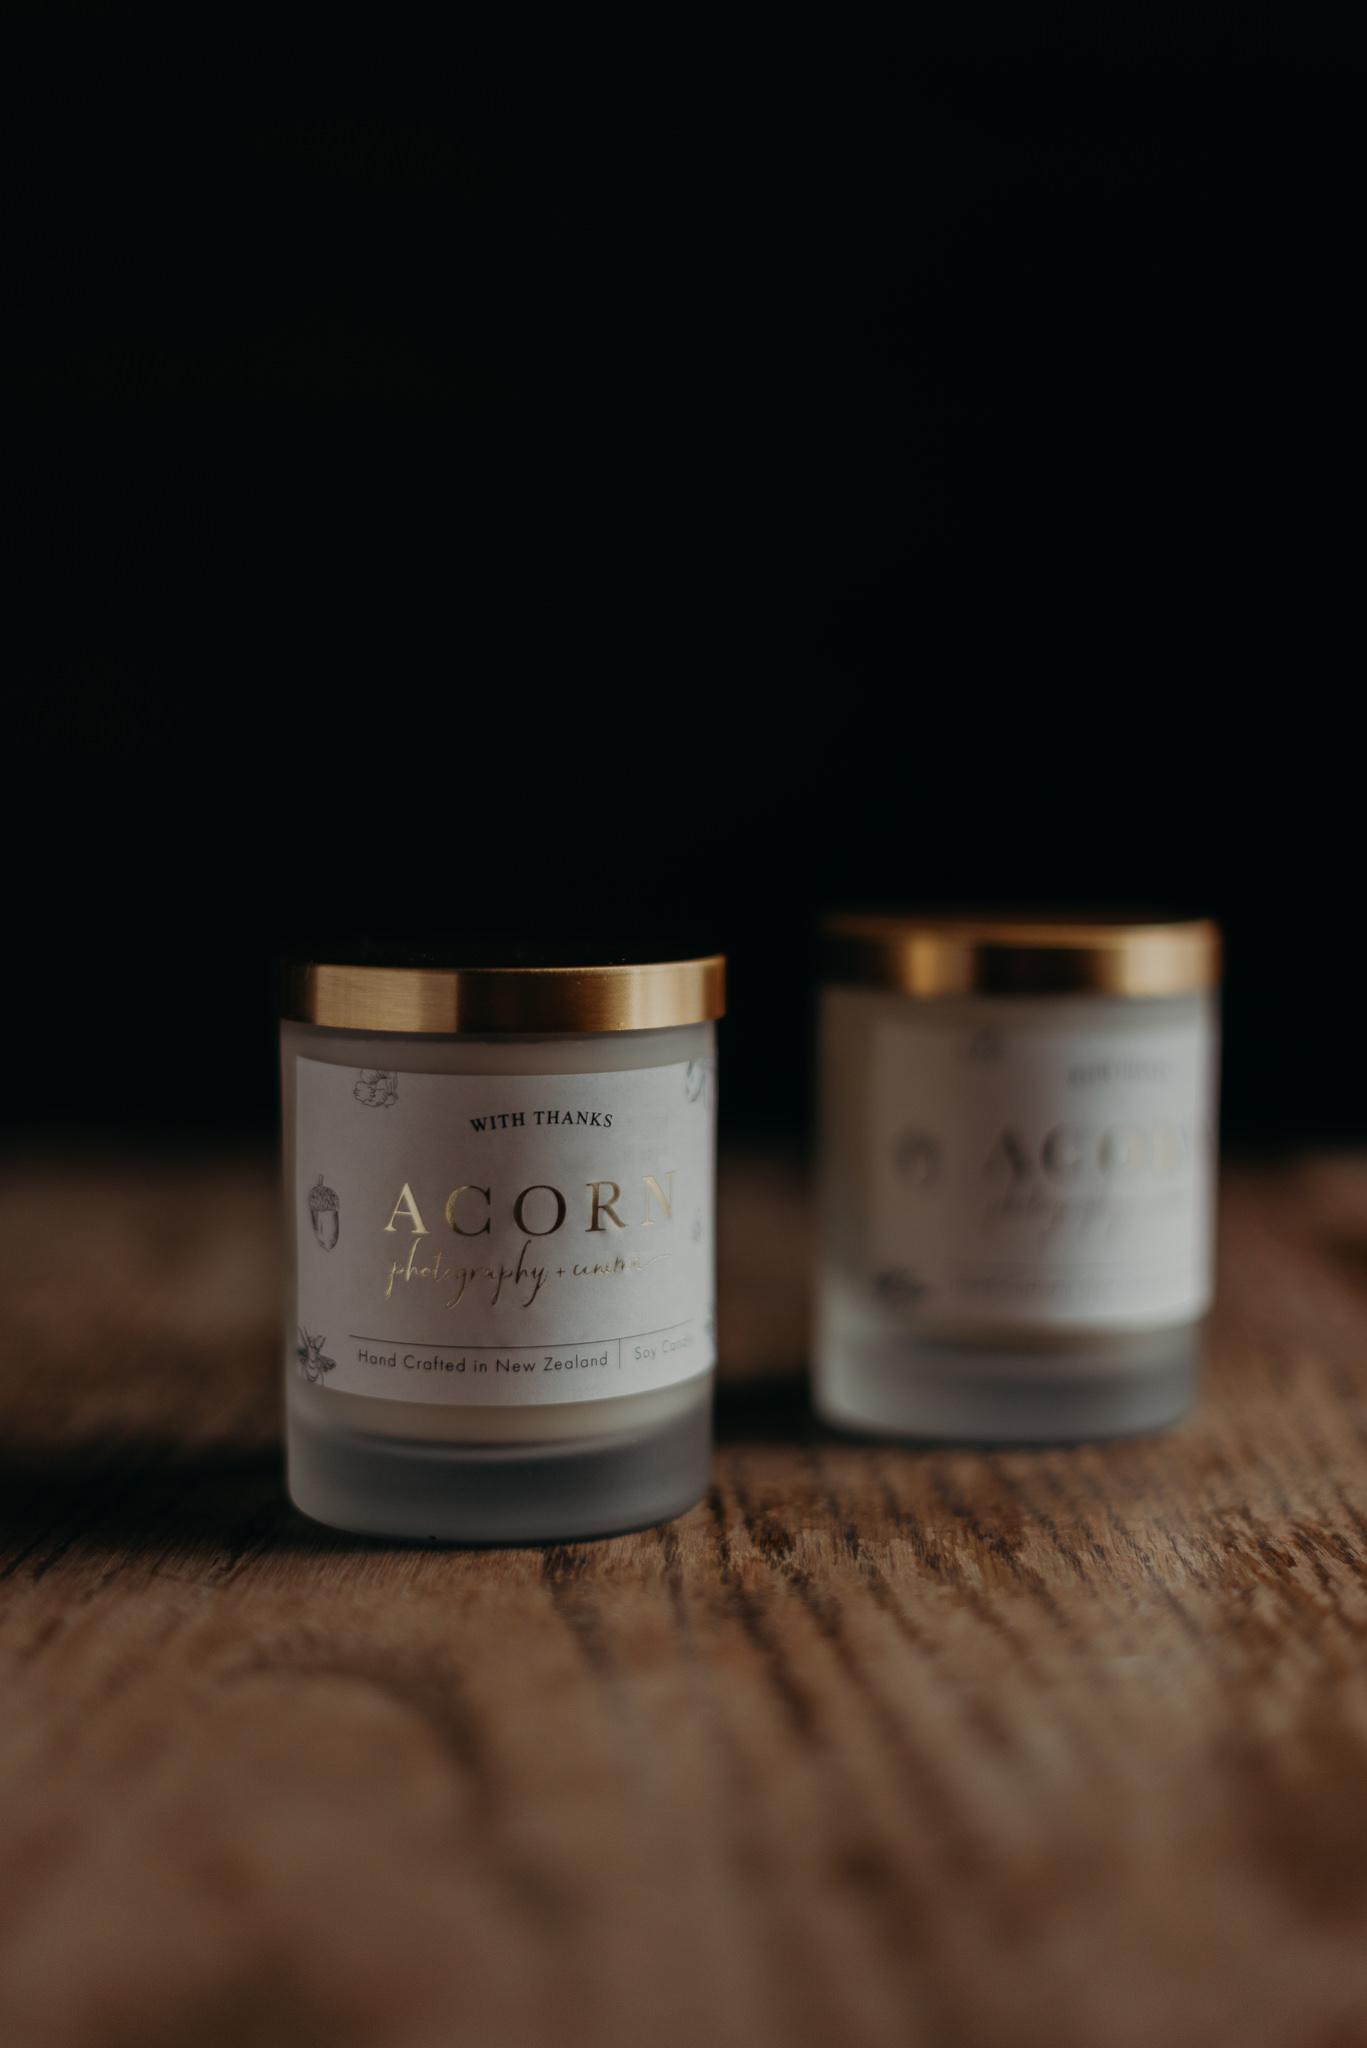 Handmade+soy+candles+-+Acorn+Photography+&+Cinema+Branding+and+packaging.+New+Zealand+Wedding+Photographer._-10.jpeg